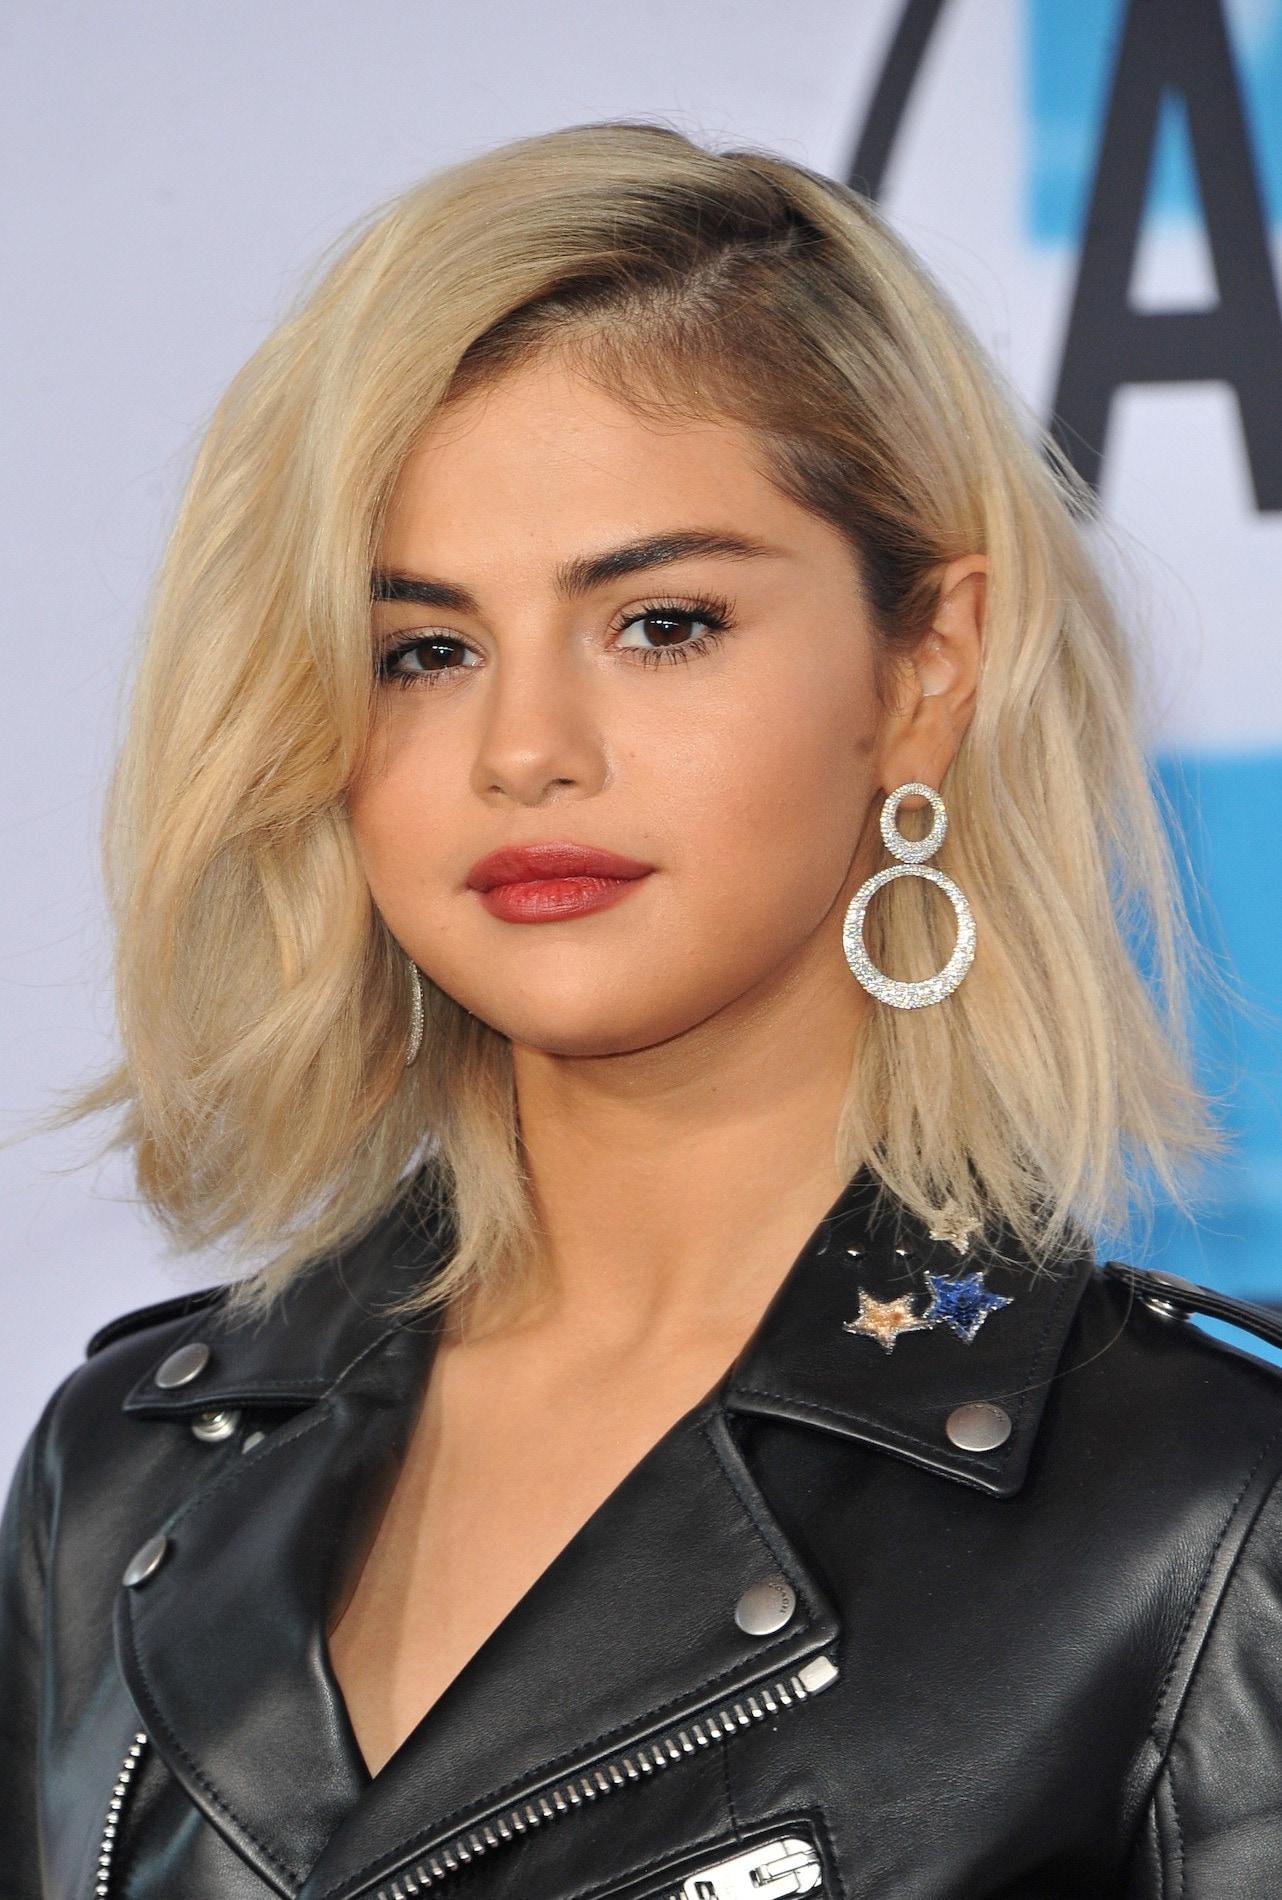 Selena Gomez dengan model rambut pendek bob sebahu warna pirang